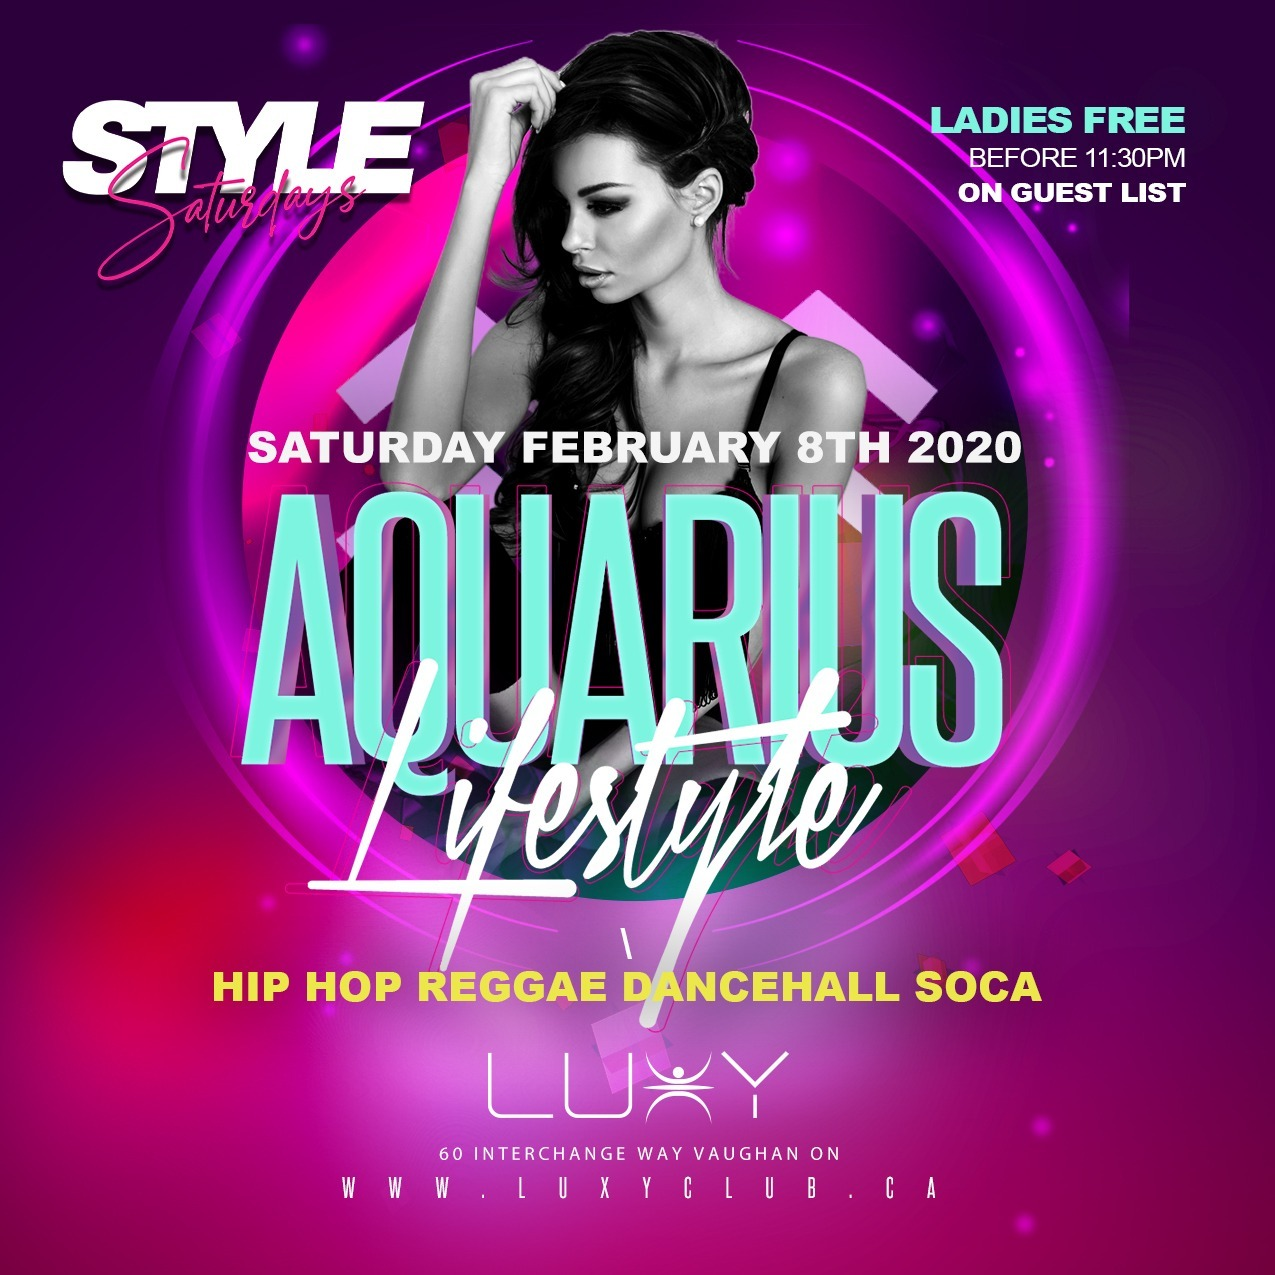 Style Saturdays @ Luxy - Aquarius Lifestyle